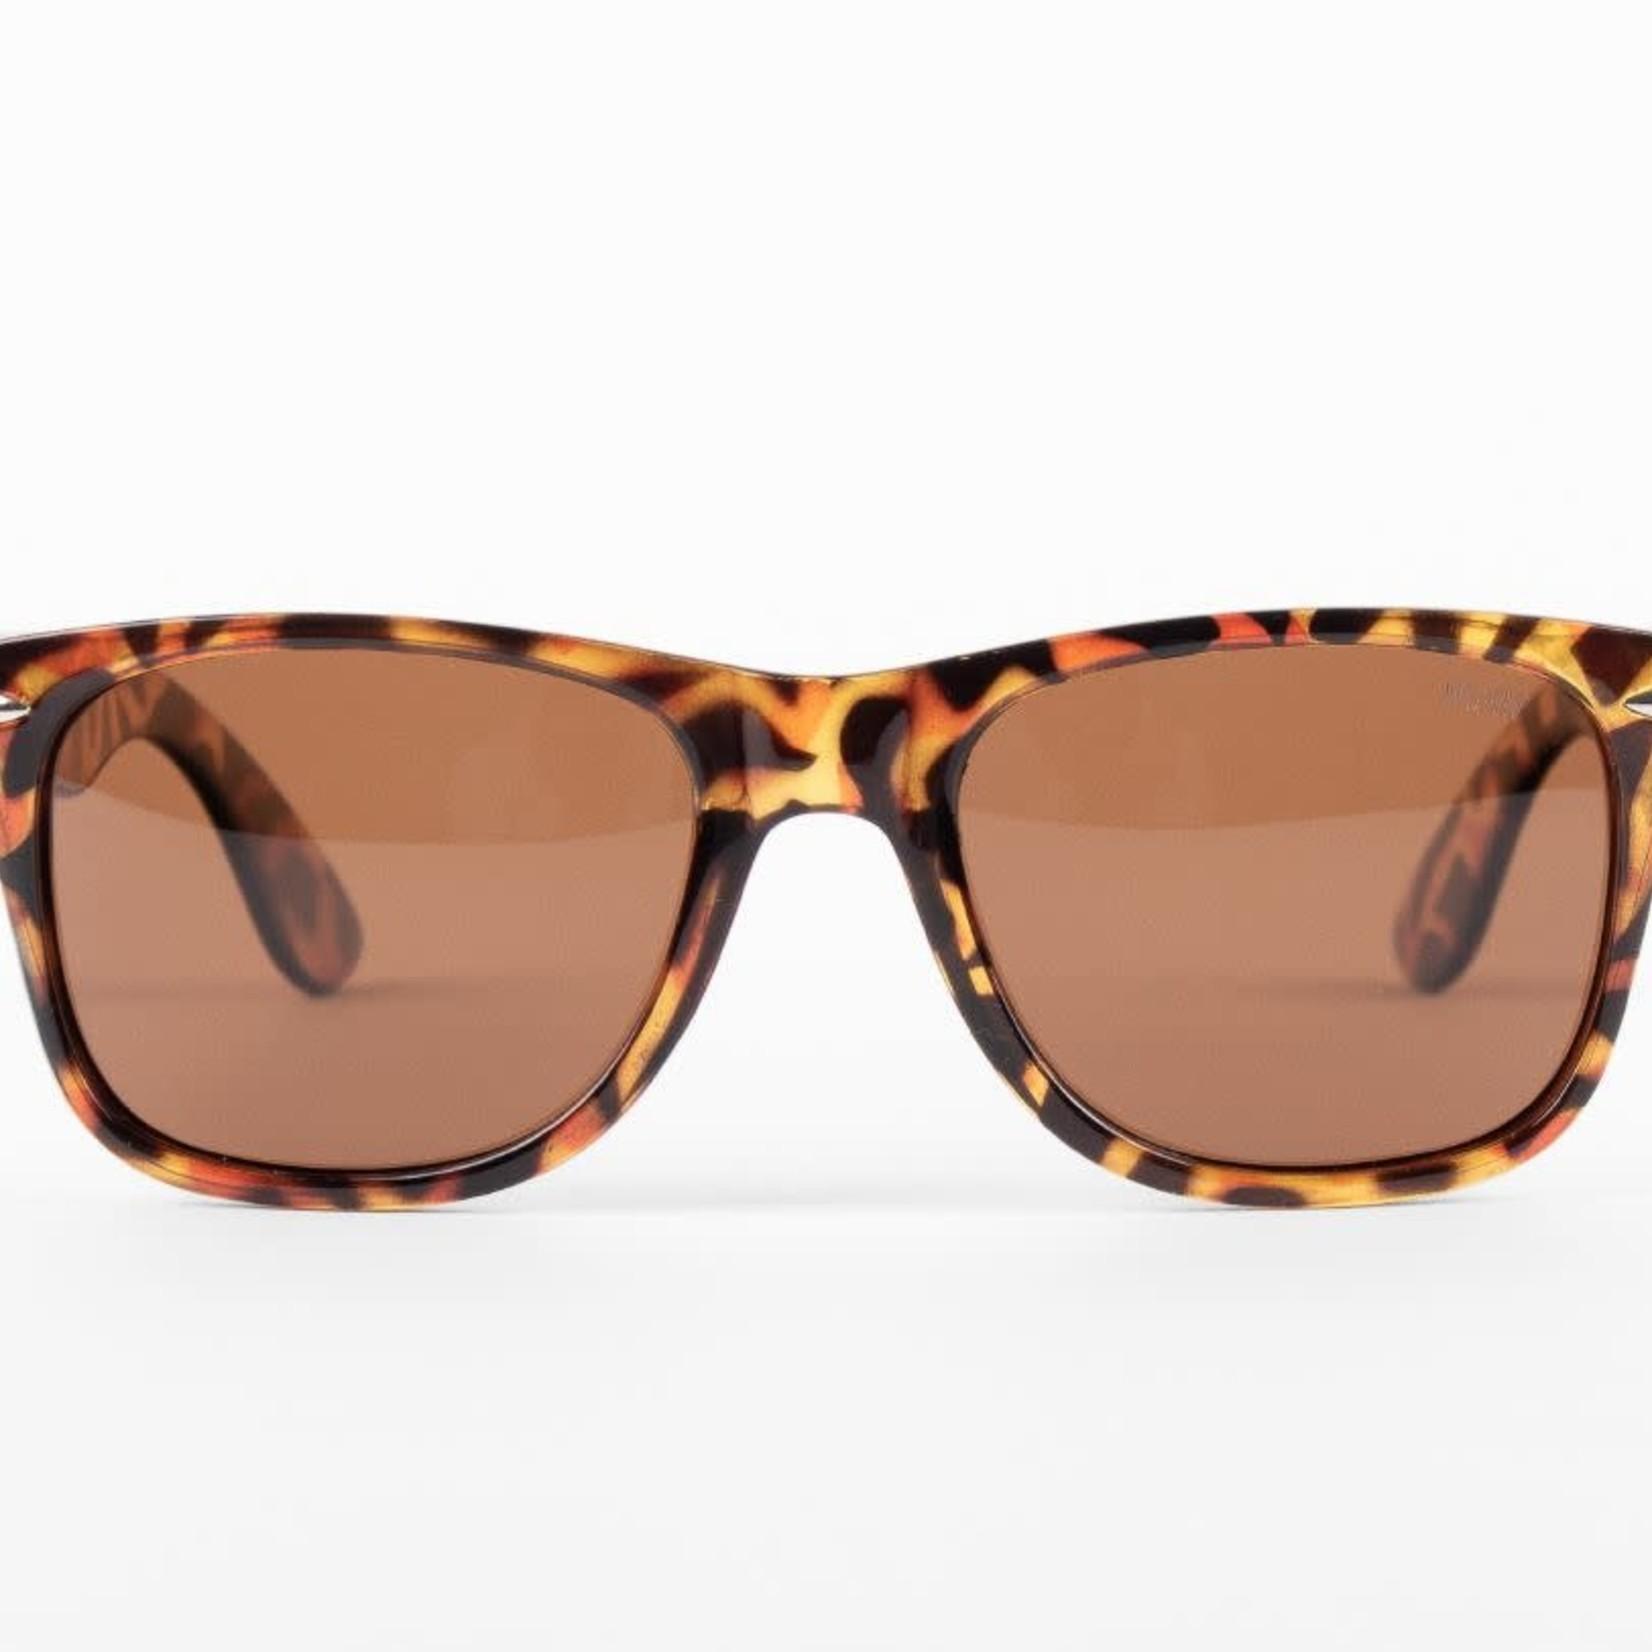 WLKN WLKN : Comb Sunglasses